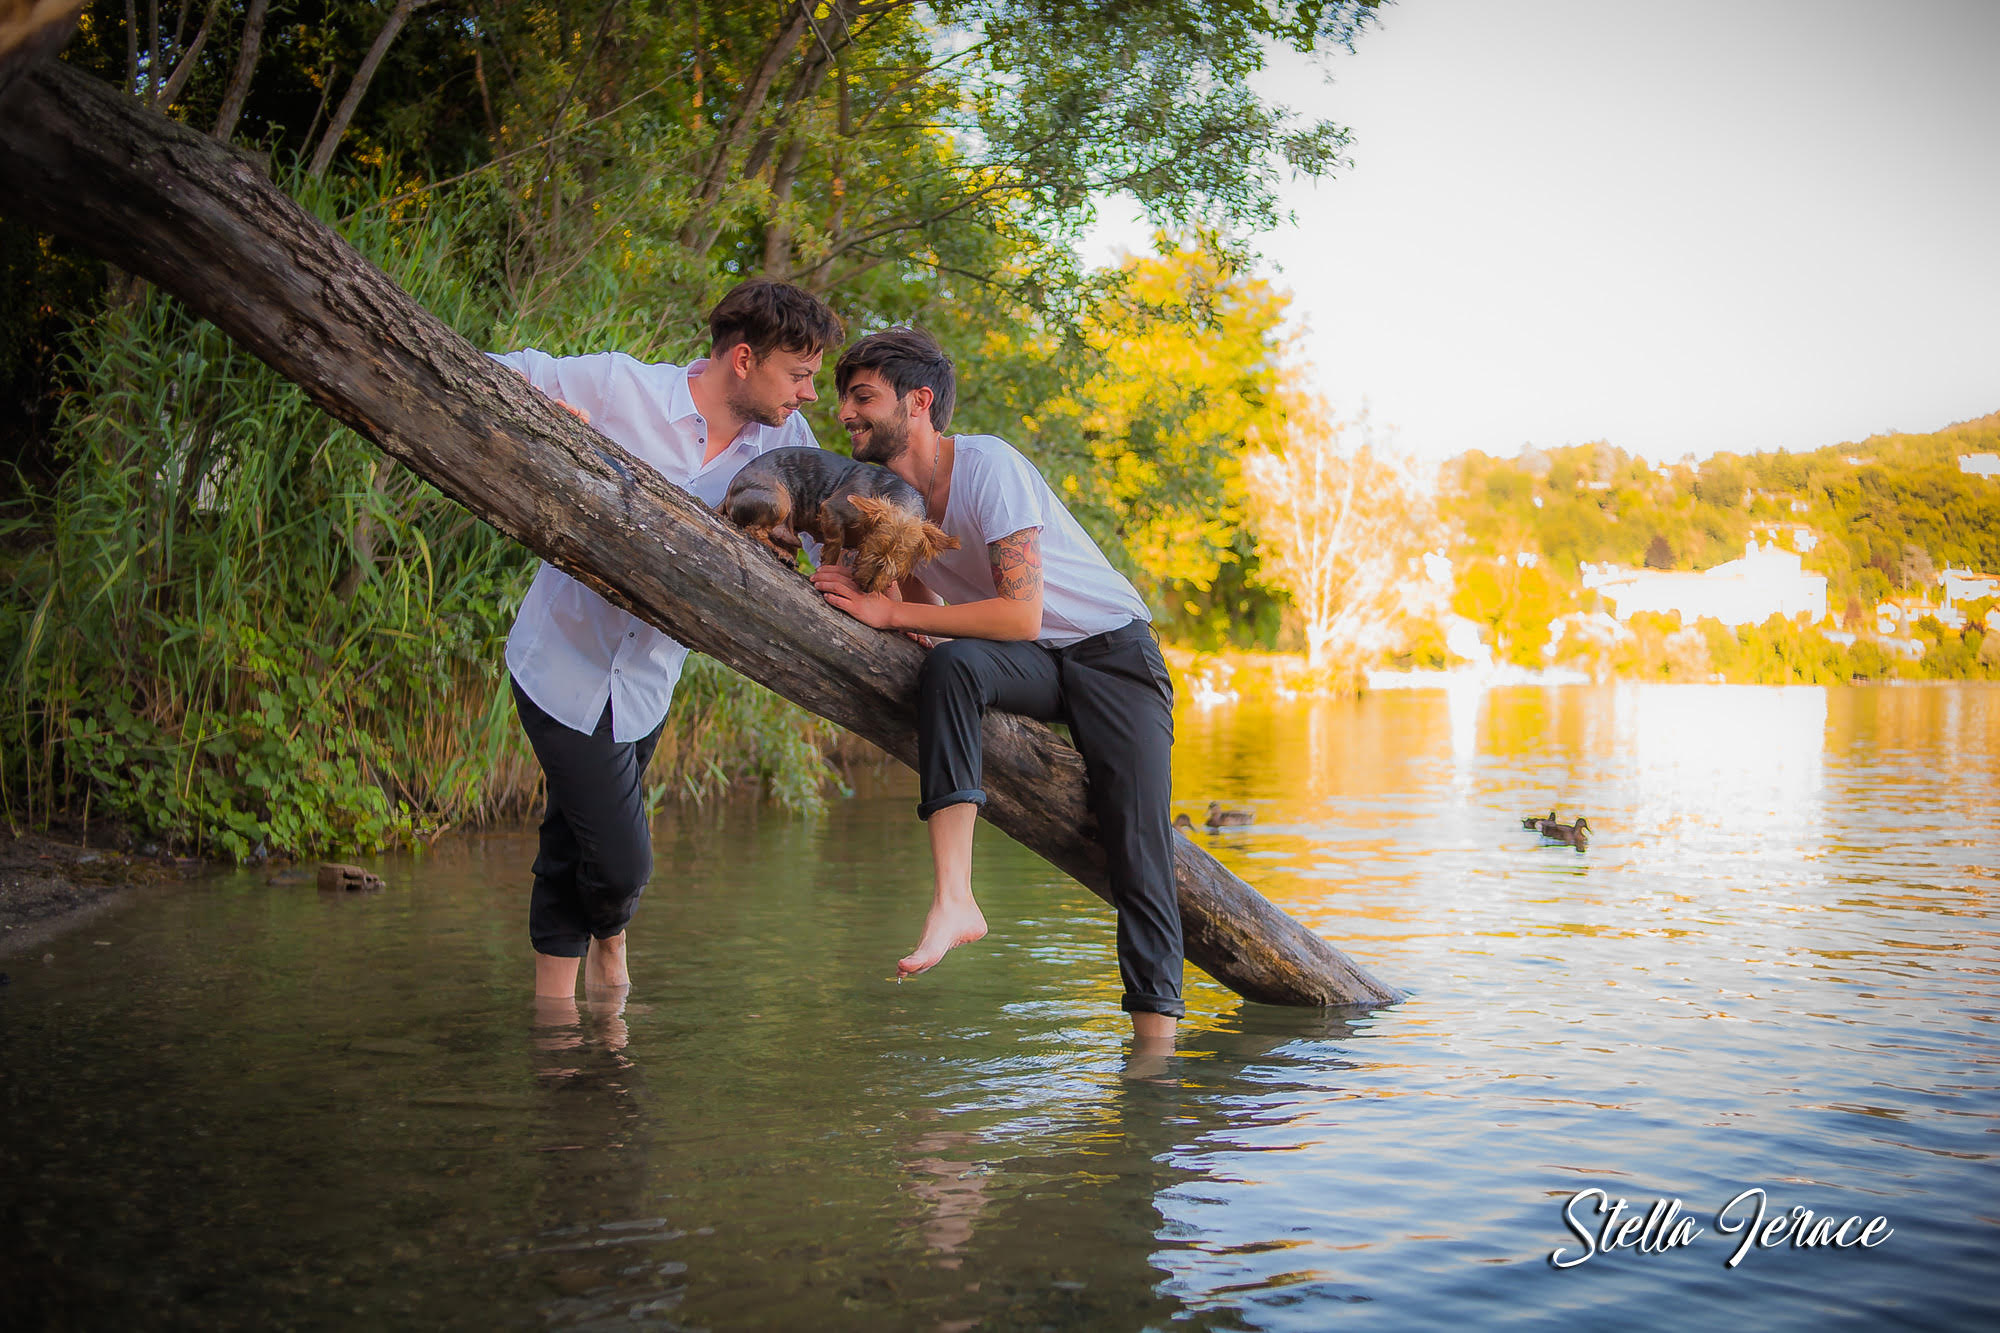 Stella Ierace Wedding & Family Photographer.